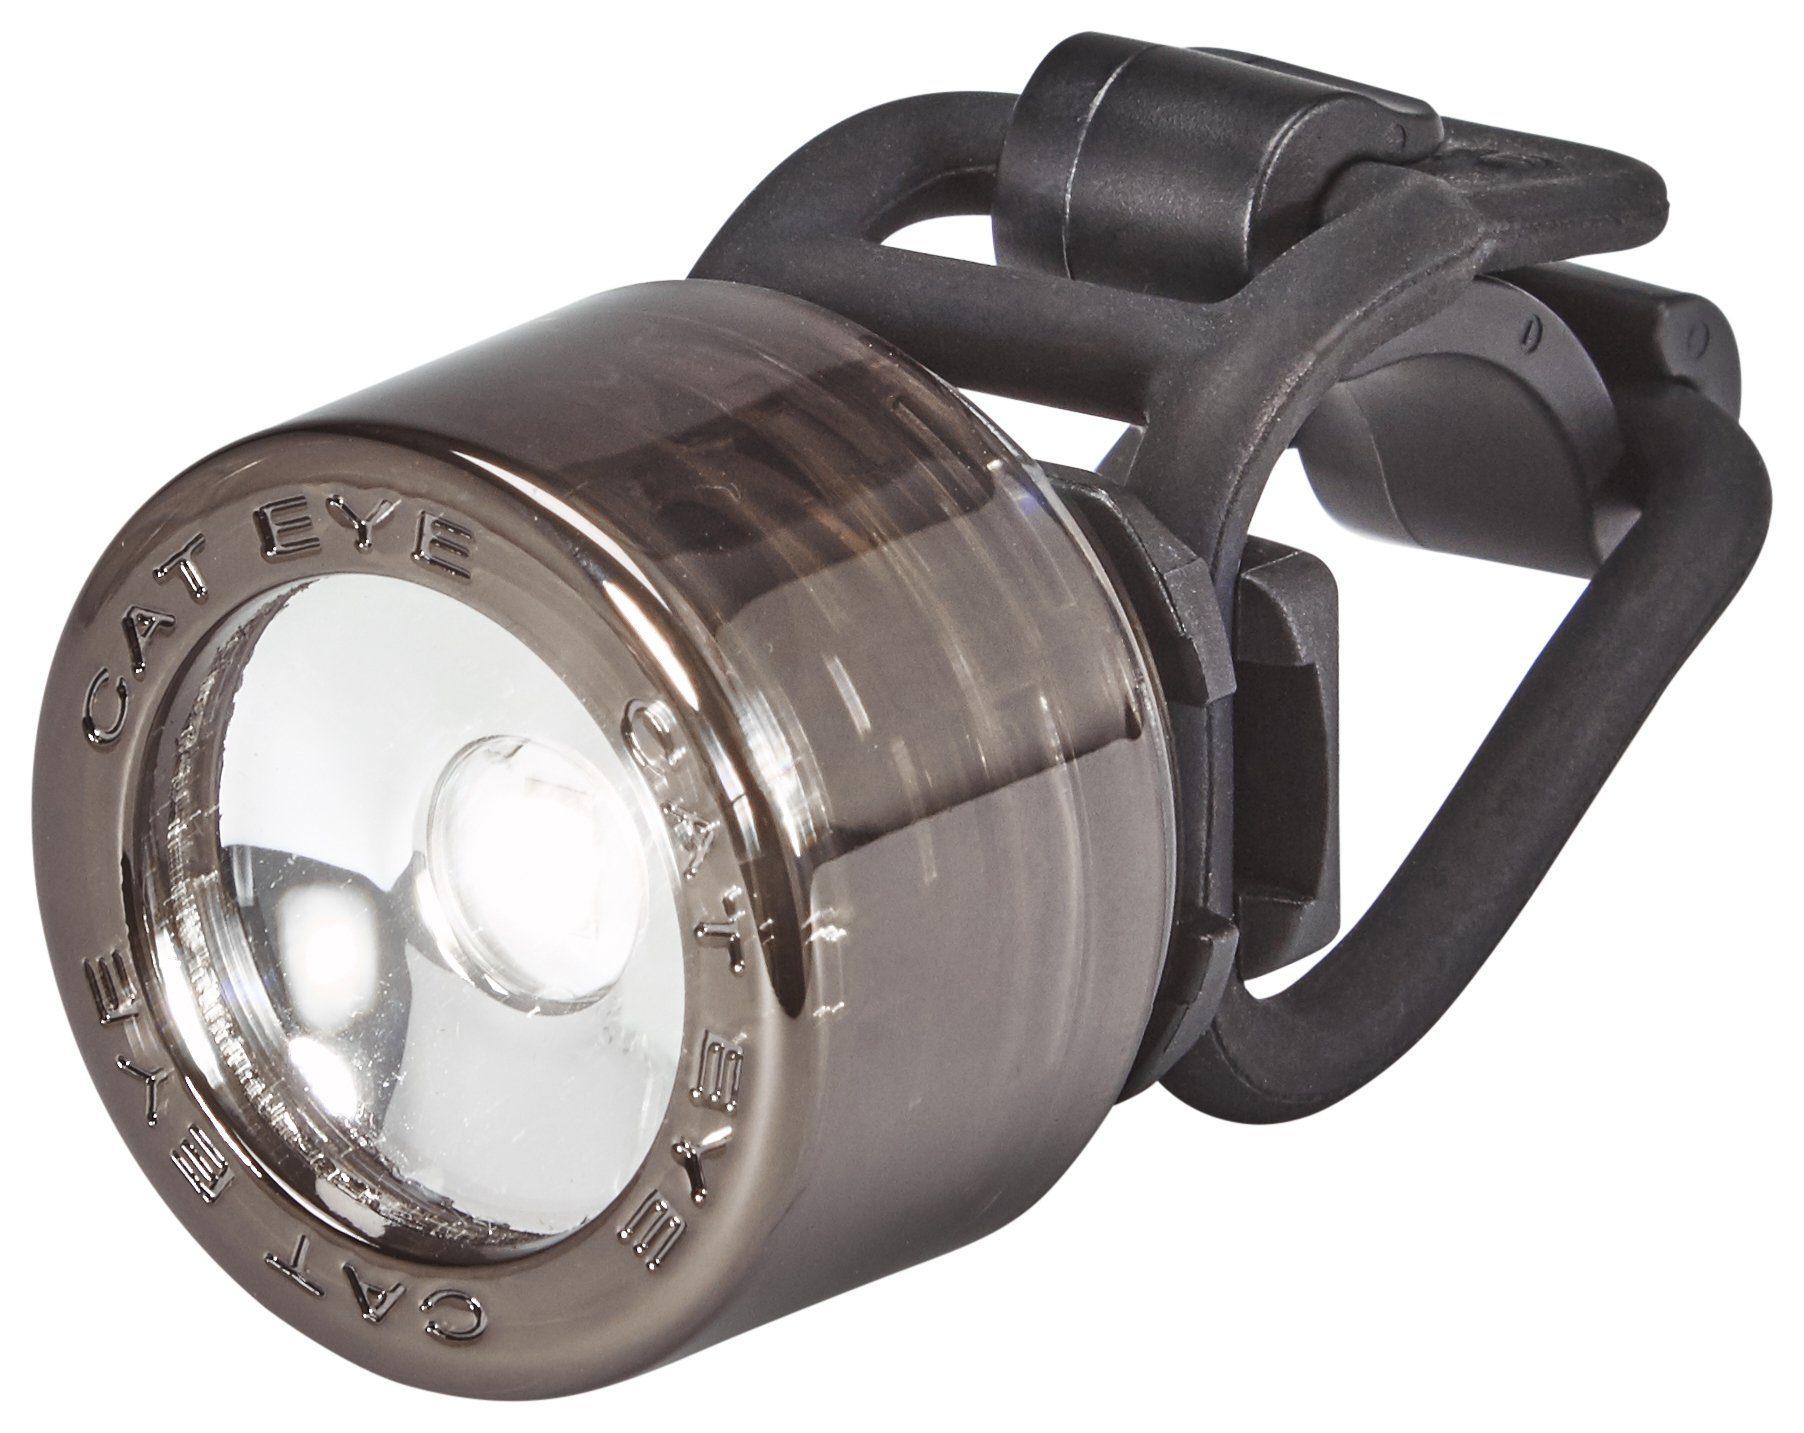 Cateye Fahrradbeleuchtung »Nima2 SL-LD135 Frontleuchte«